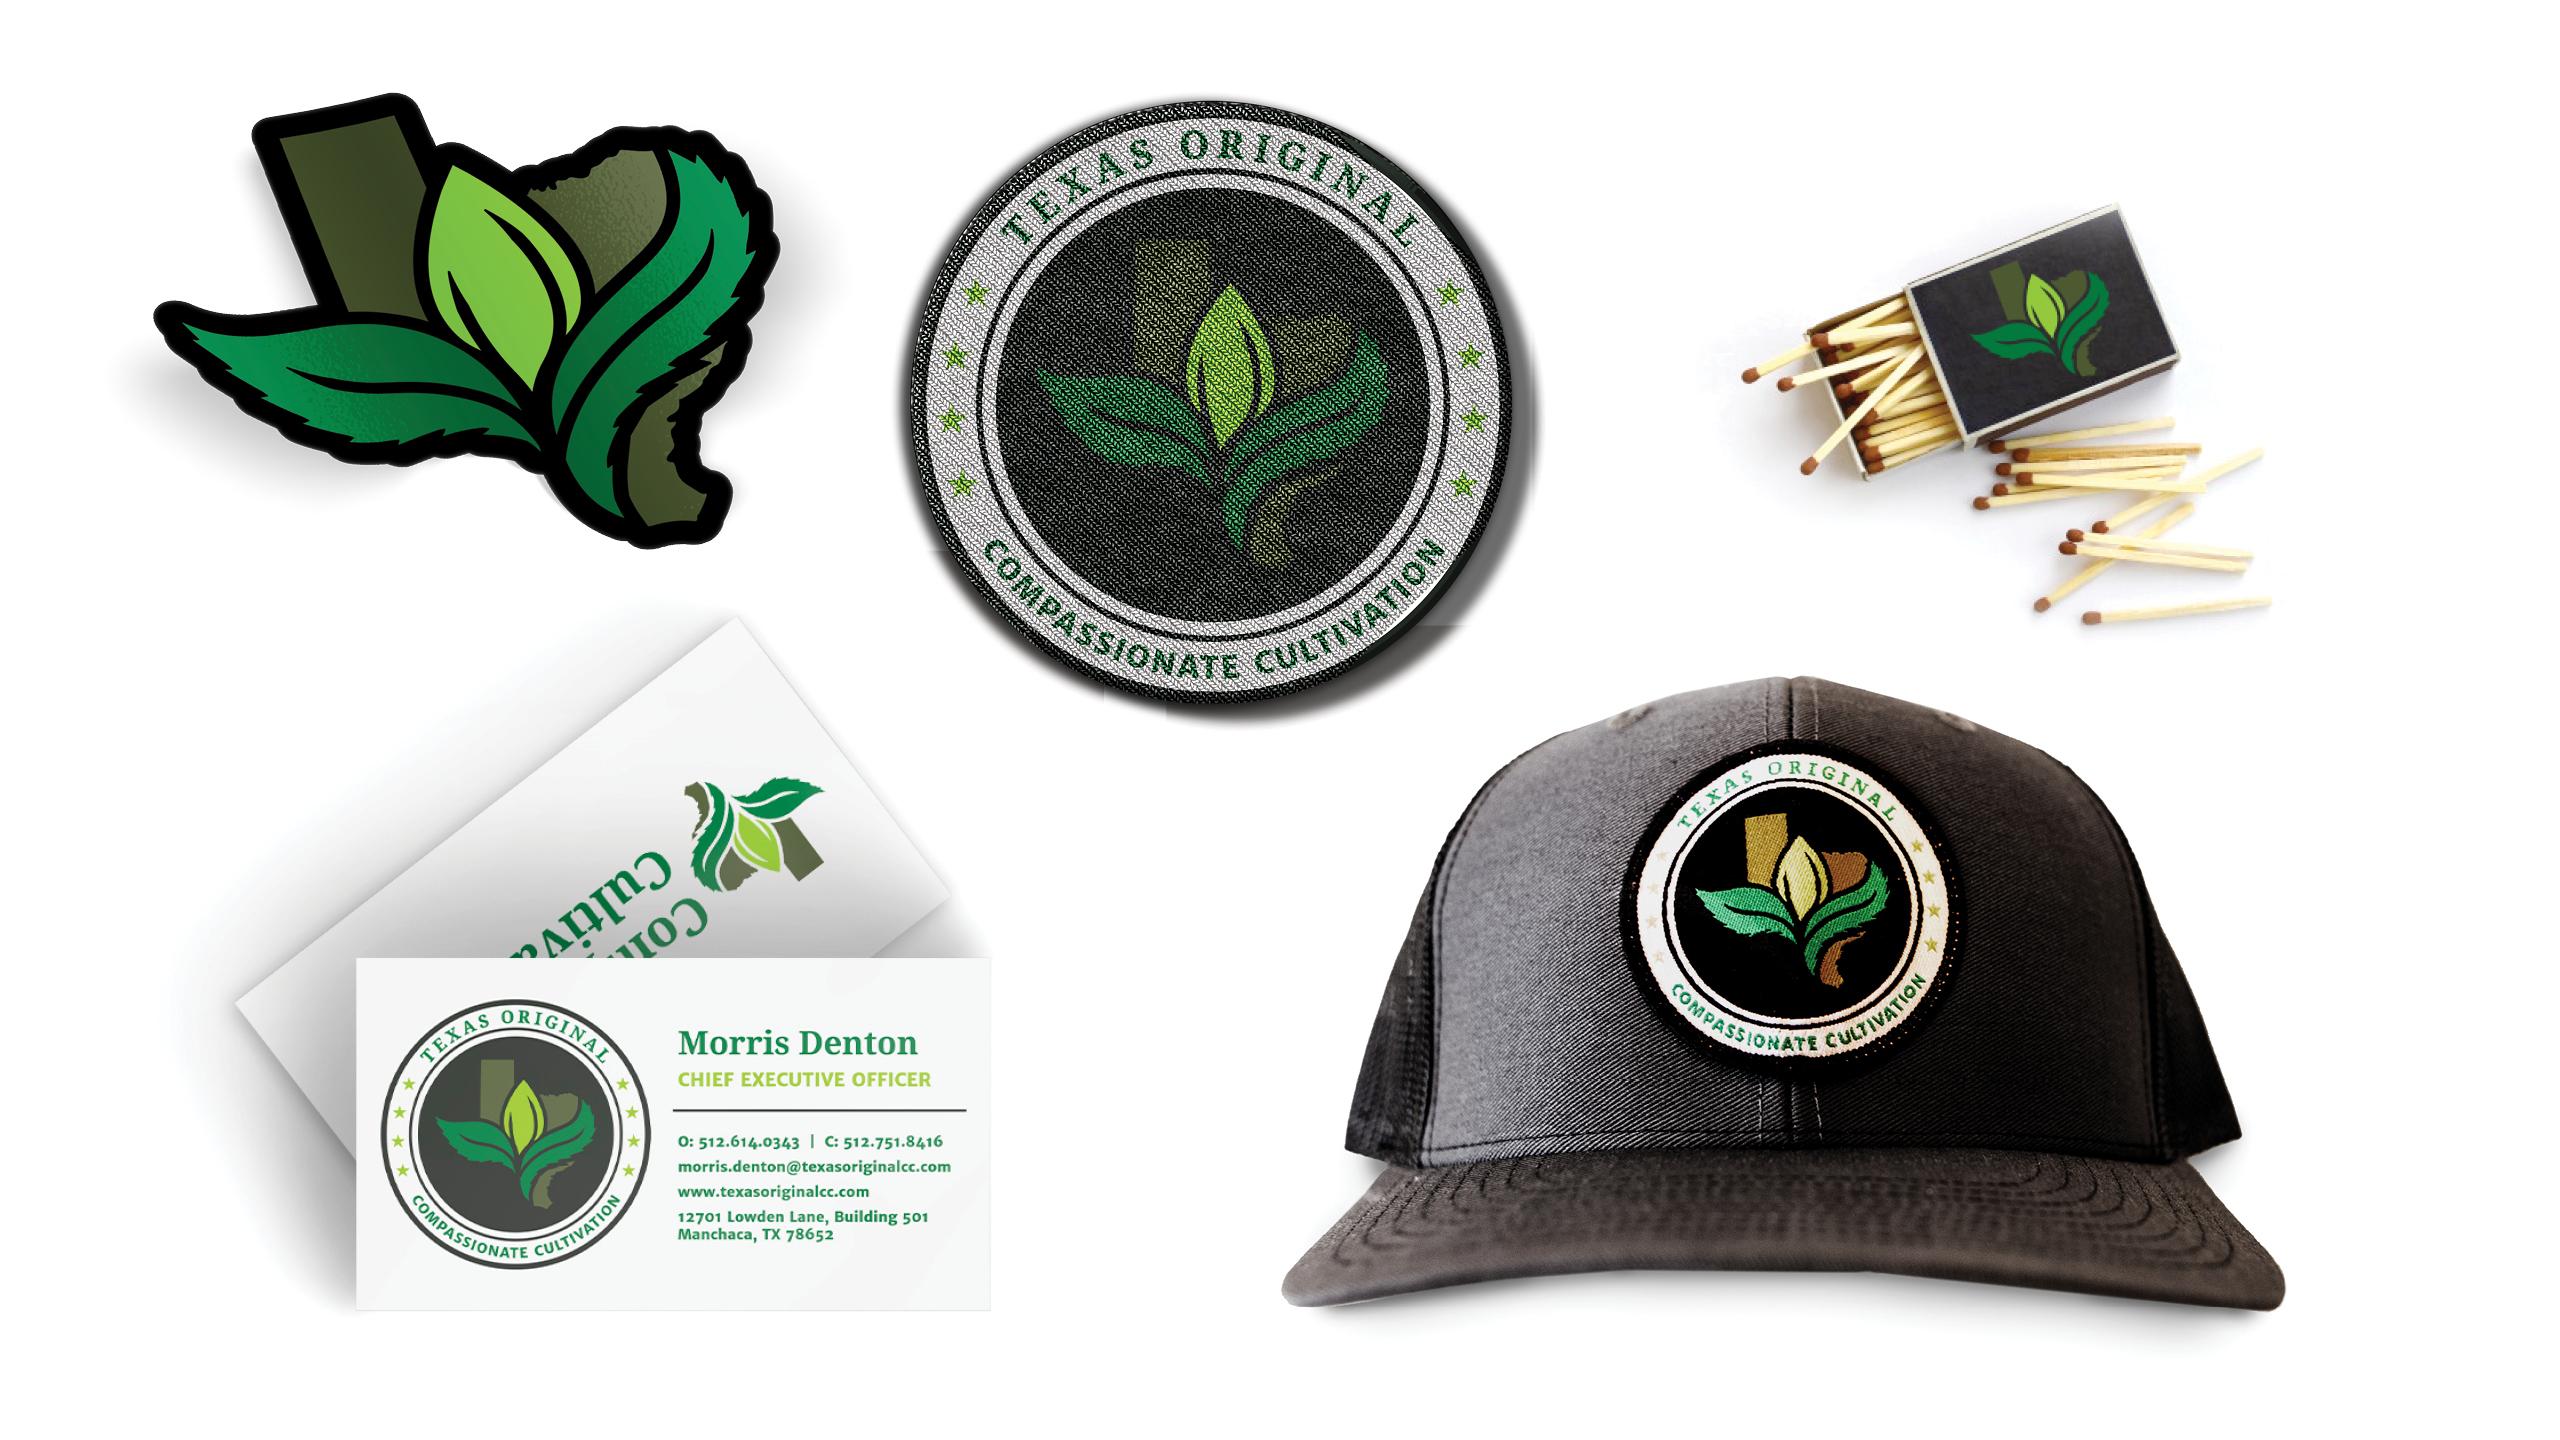 Texas Original Cannabis Company Custom Apparel & Branded Collateral by High Road Design Studio